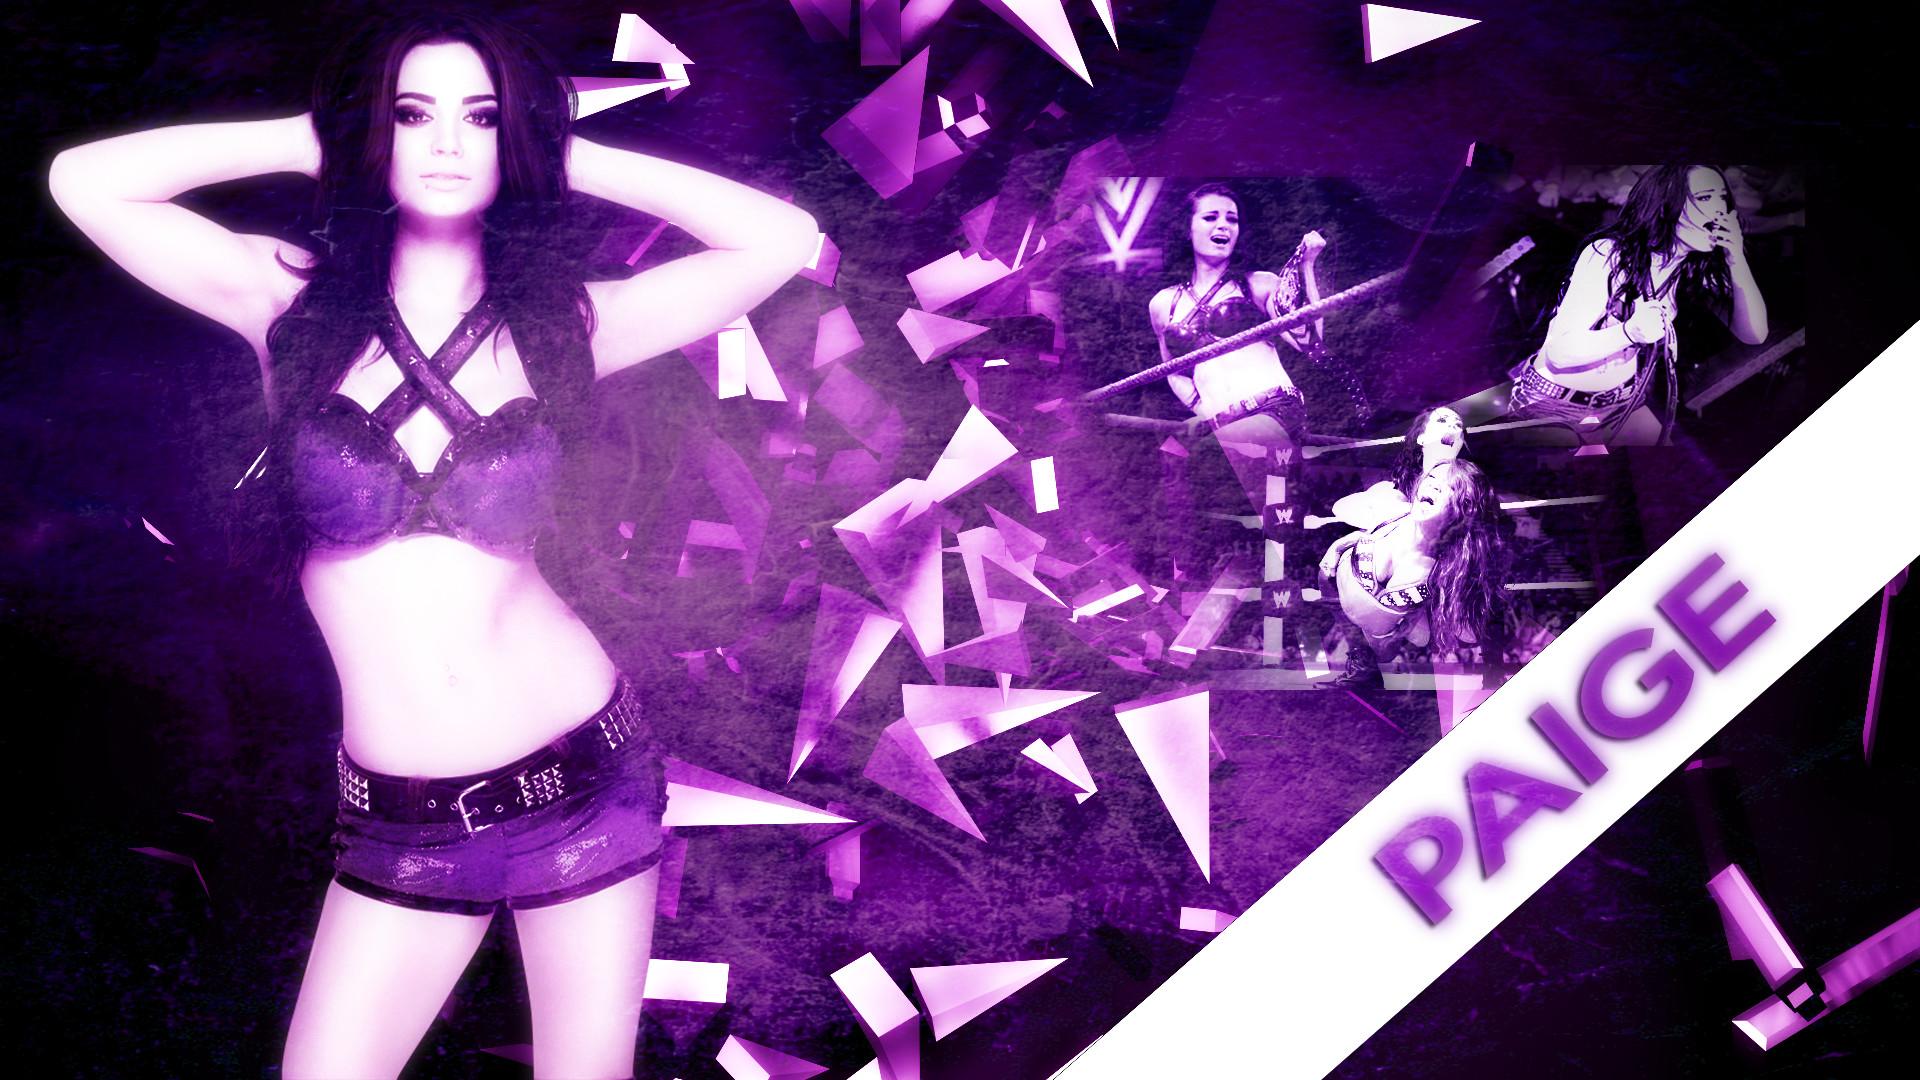 Paige WWE photos